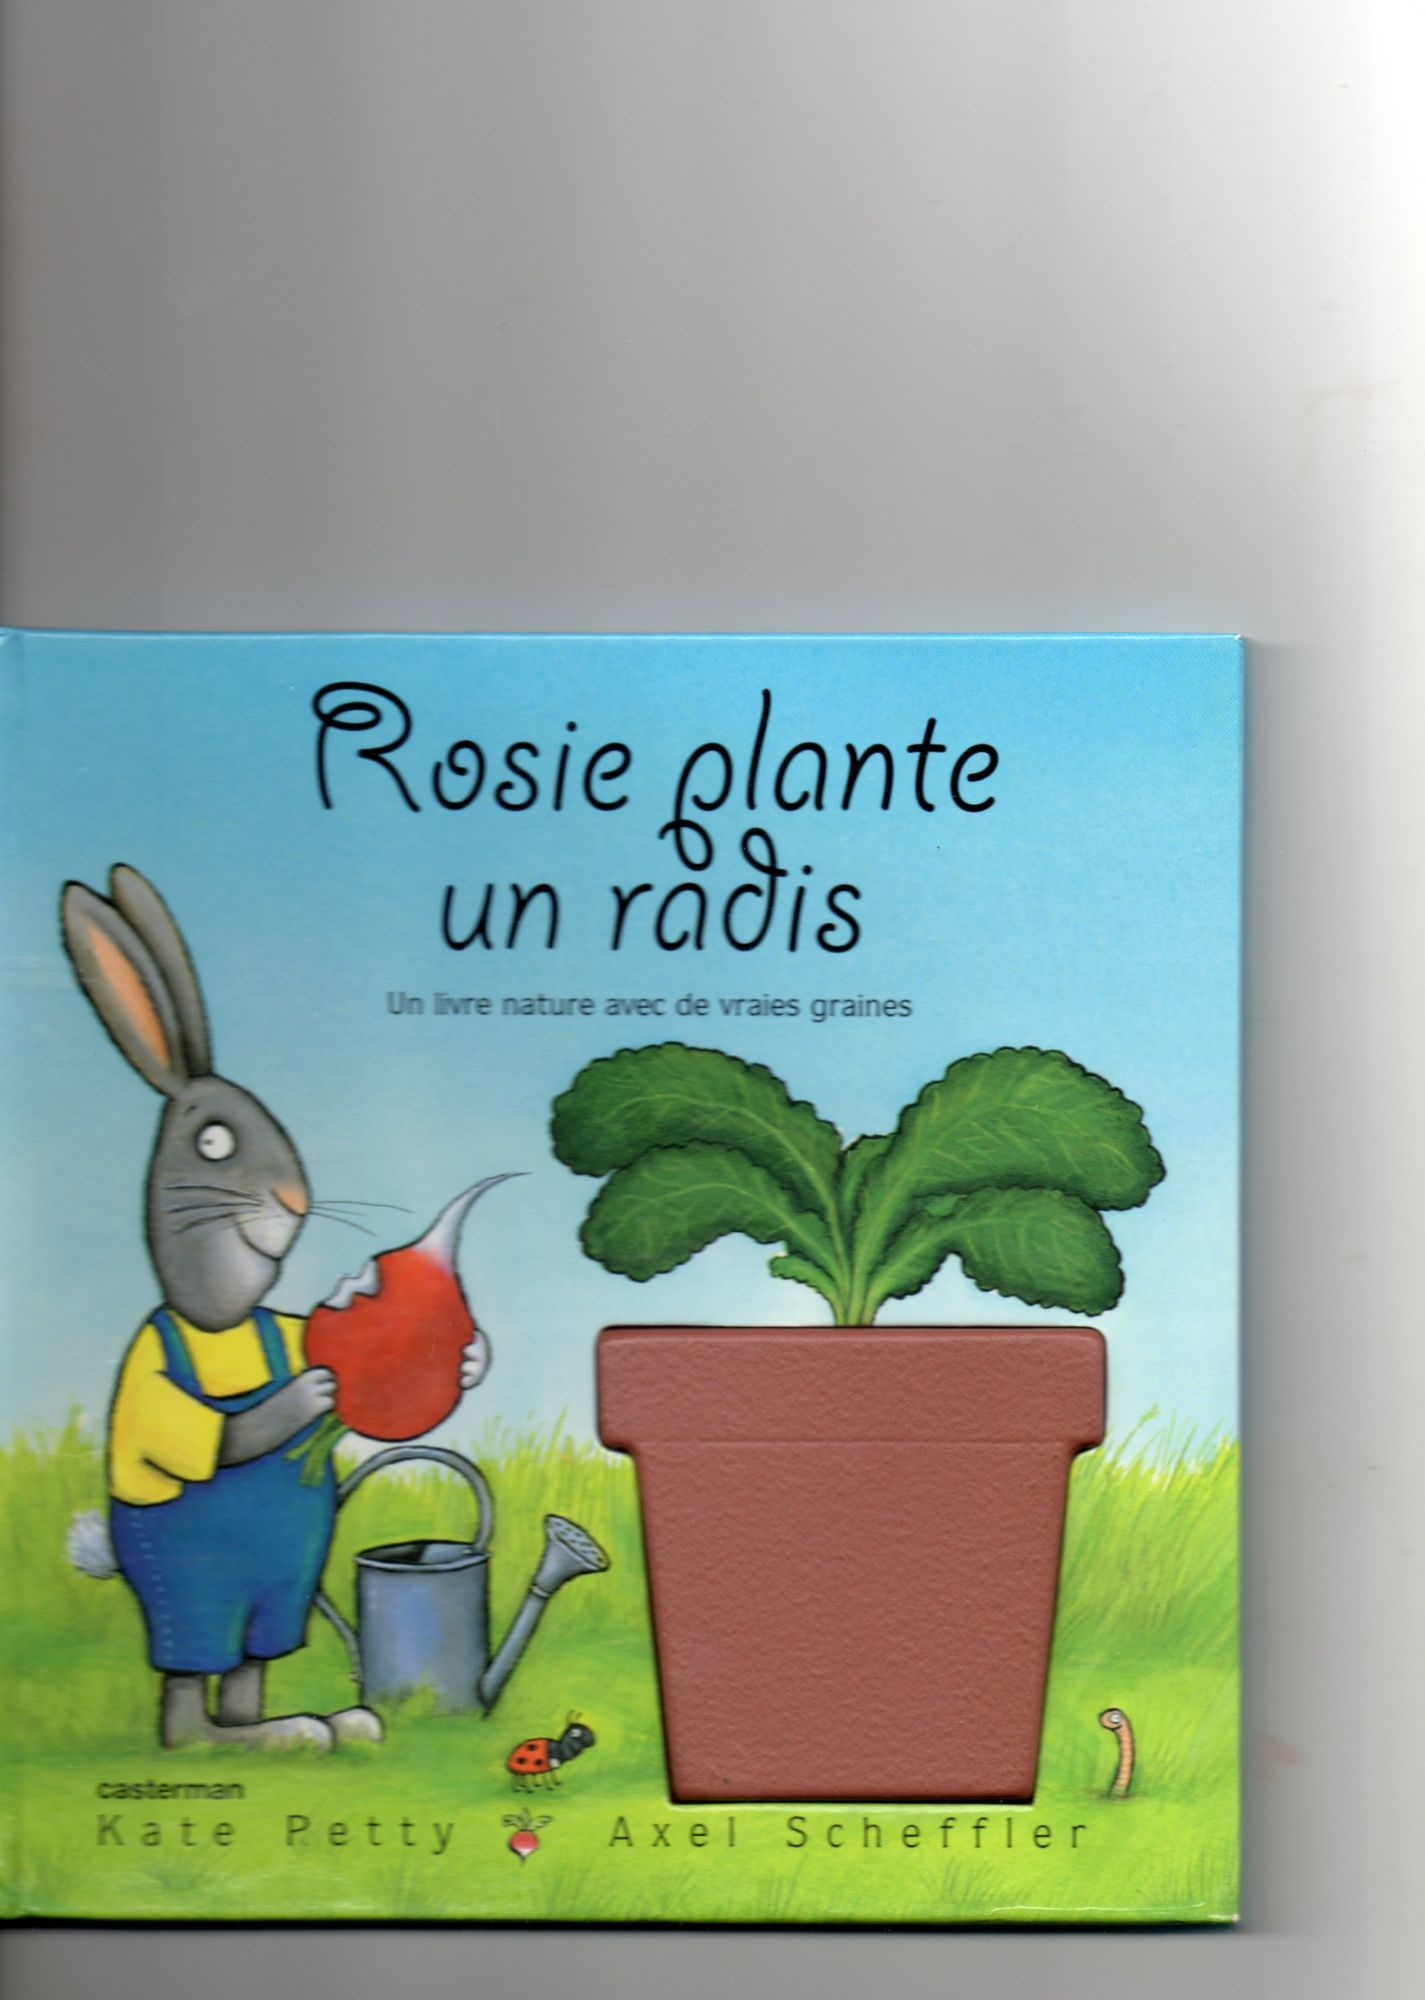 Rosie plante un radis